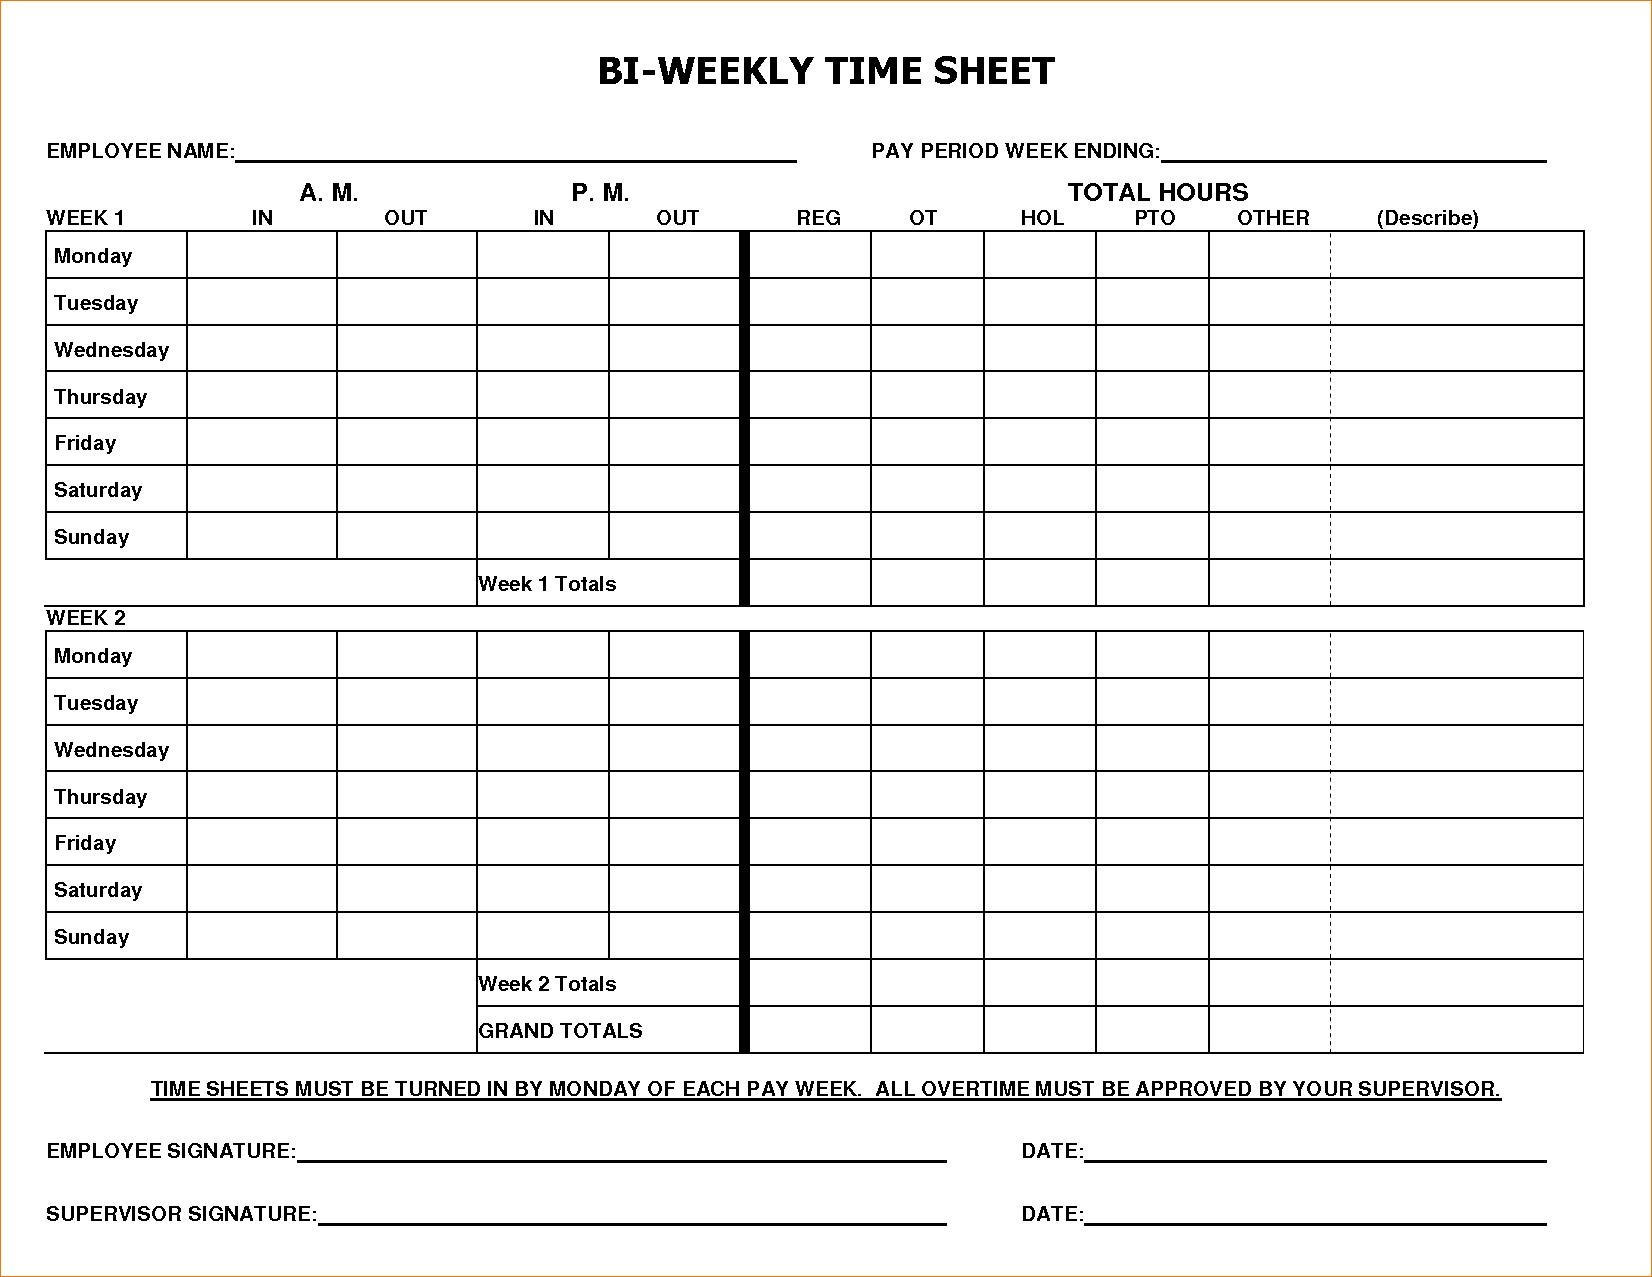 Free Bi Weekly Employee Timesheet Template Sample #1770 within Employee Timesheet Template